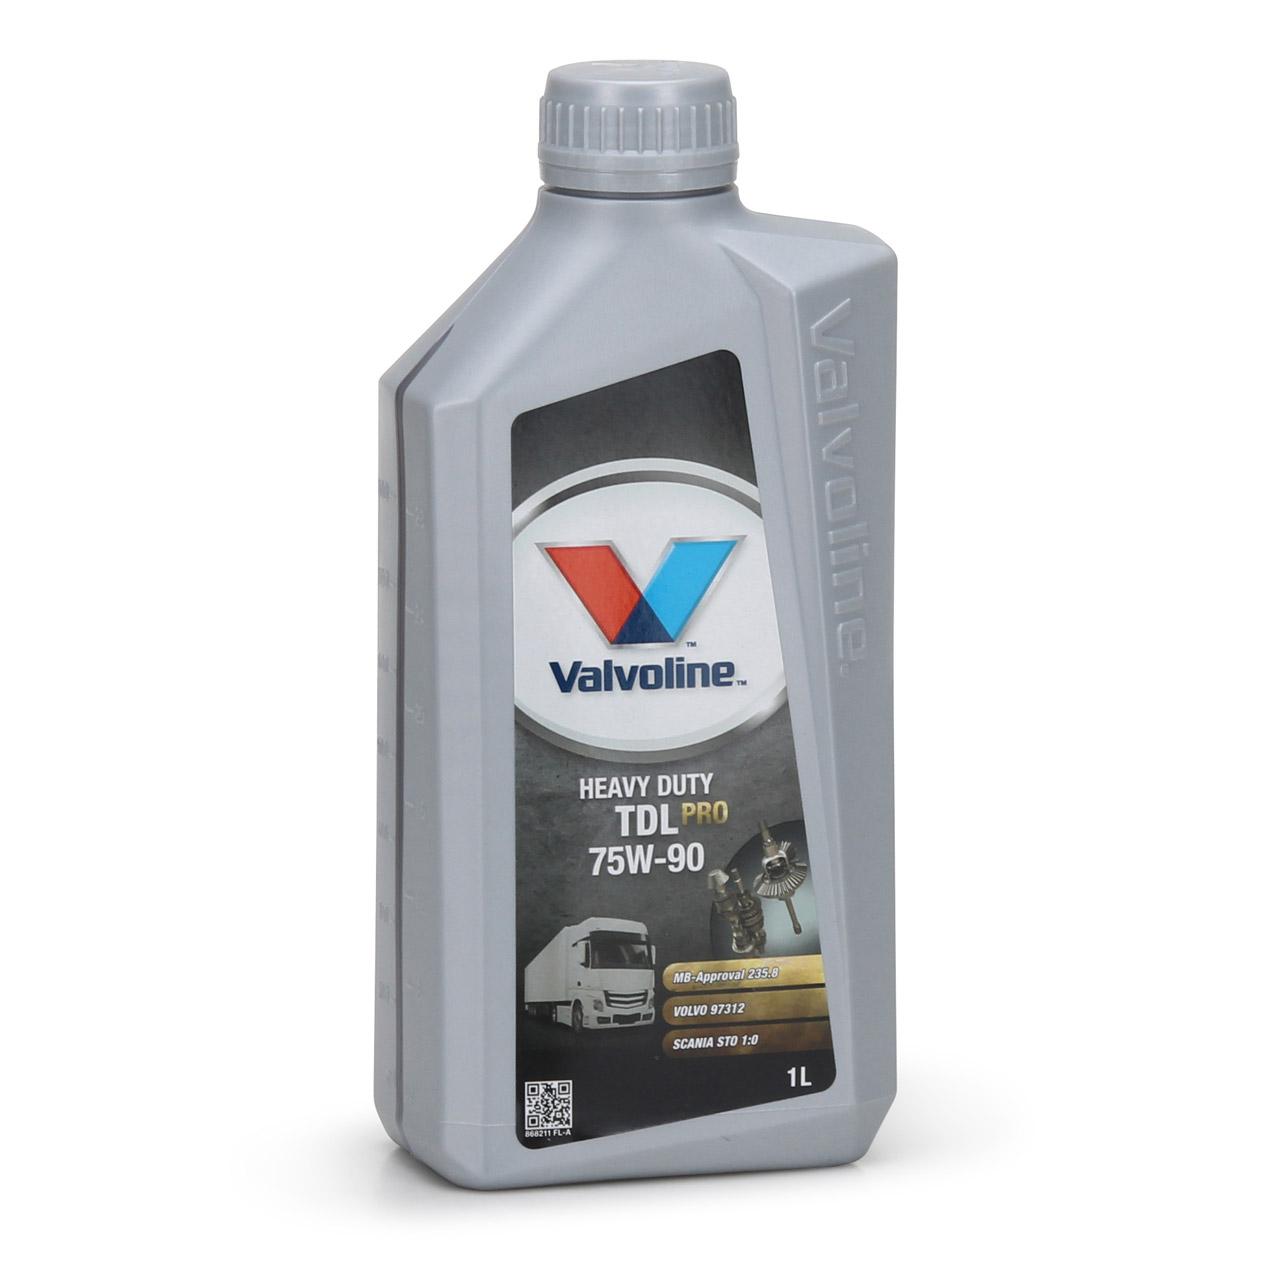 VALVOLINE Getriebeöl HEAVY DUTY TDL PRO 75W90 MB für VOLVO SCANIA - 1L 1 Liter